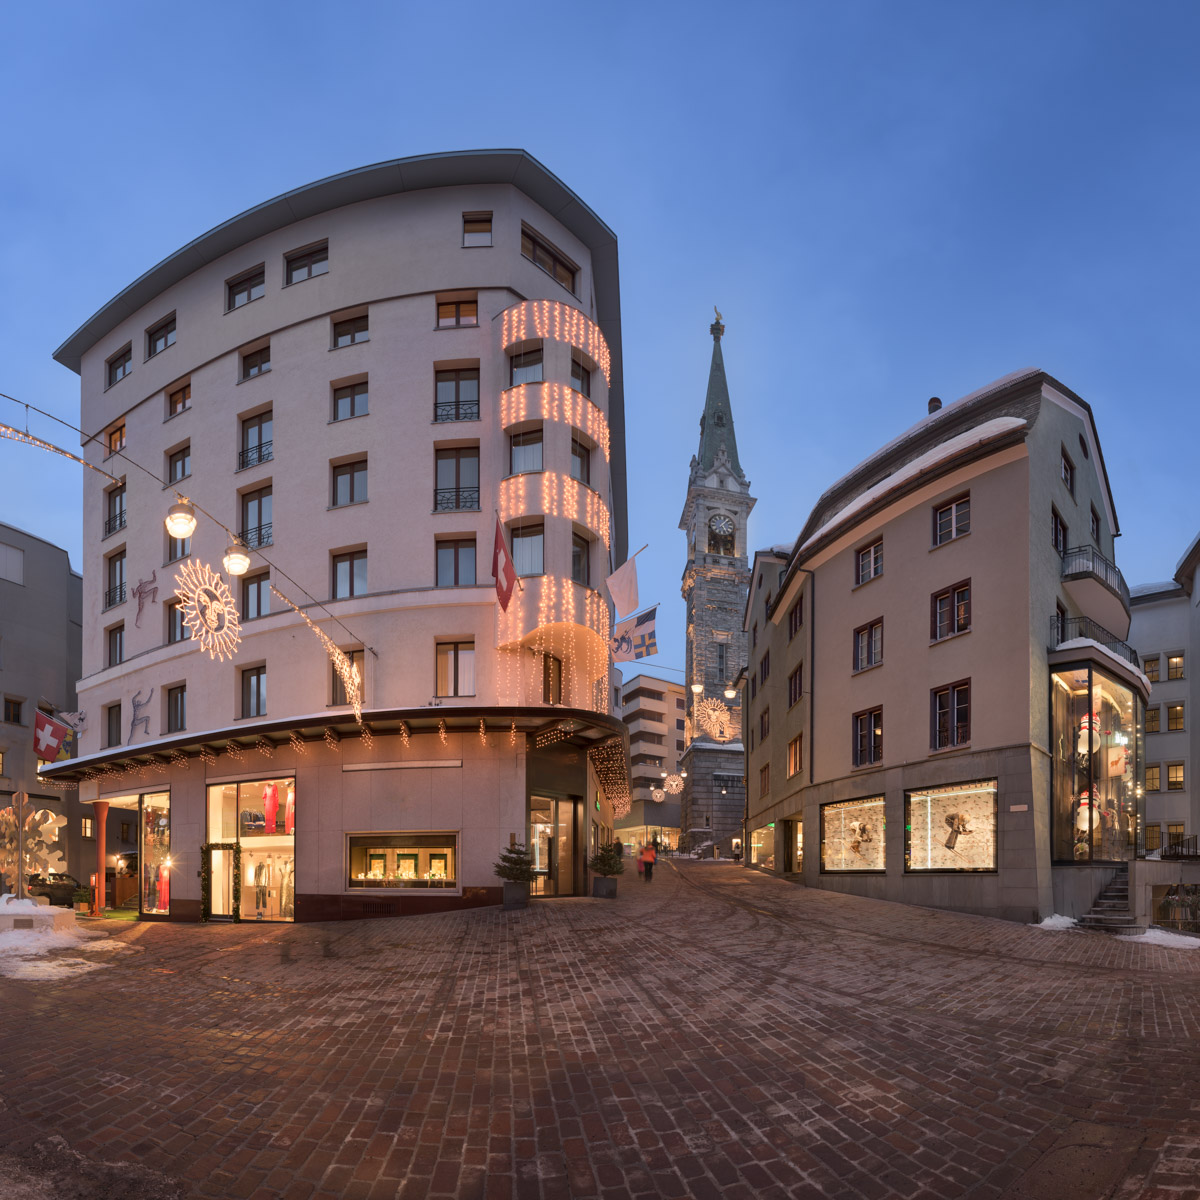 Via Maistra and Reformed Church, St Moritz, Switzerland